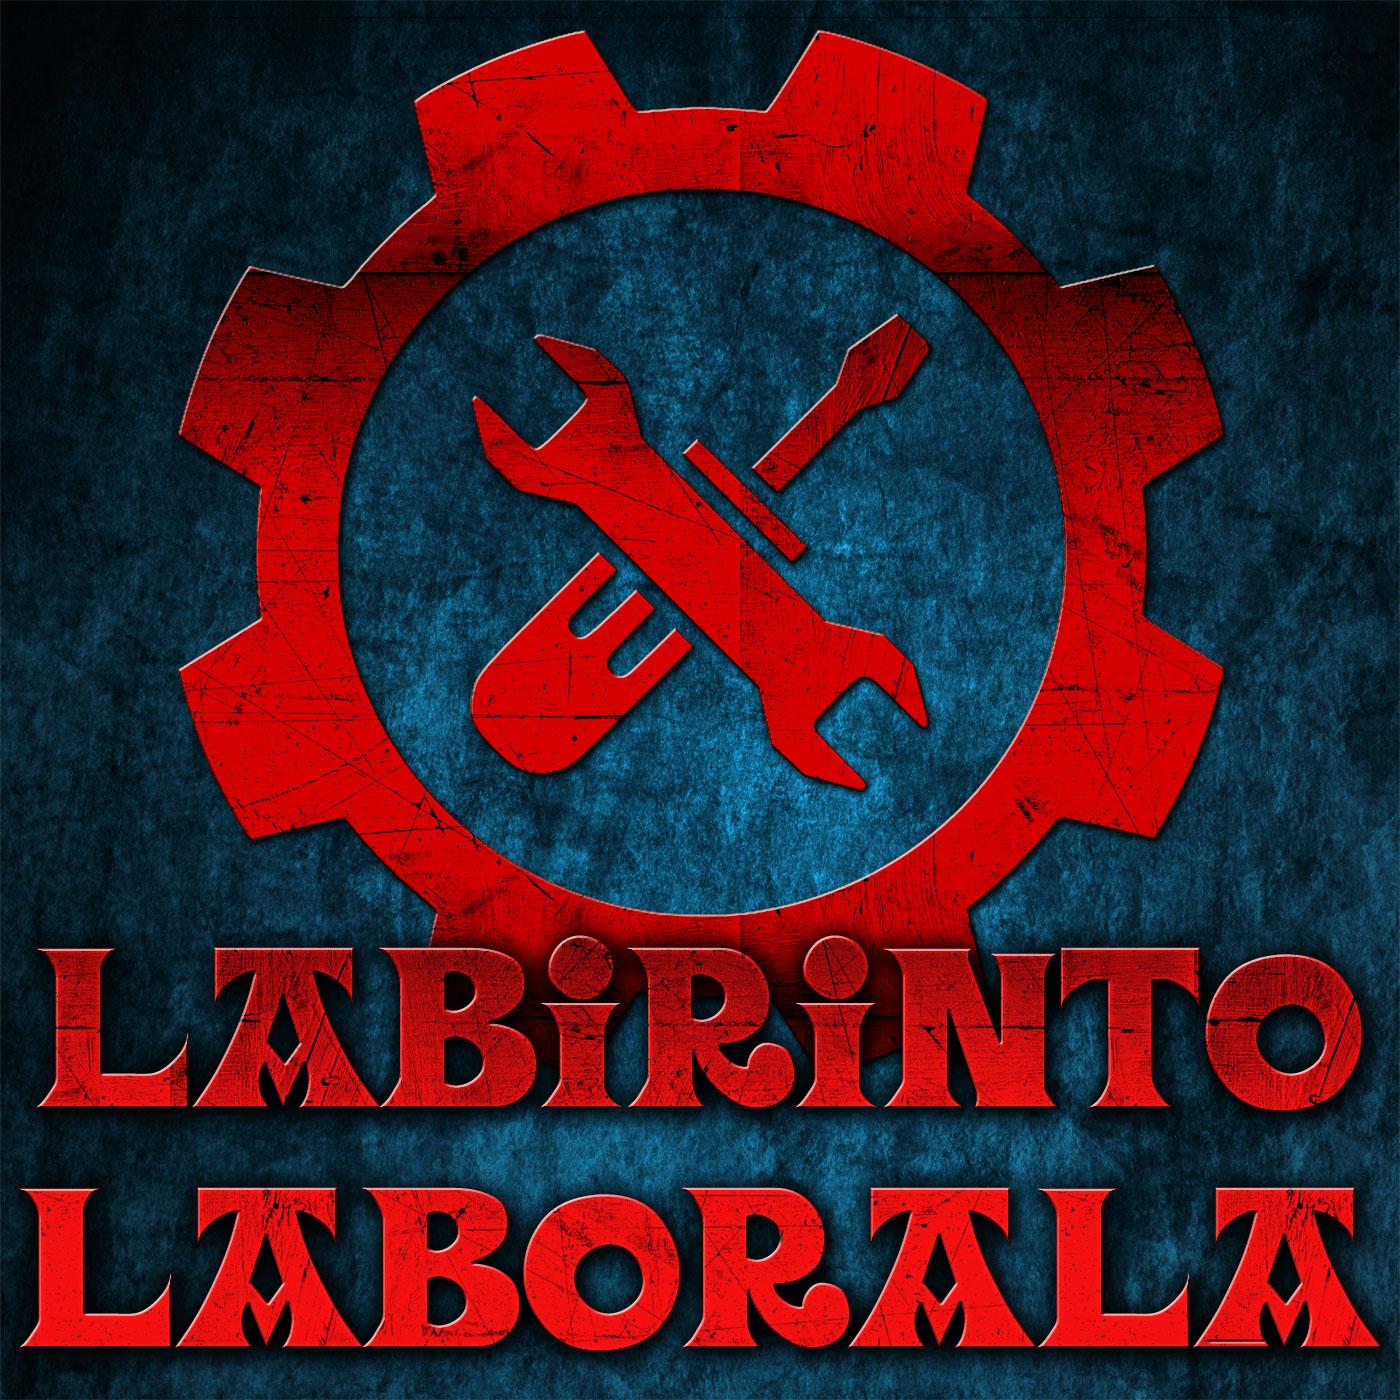 Labirinto laborala – Eguzki irratia